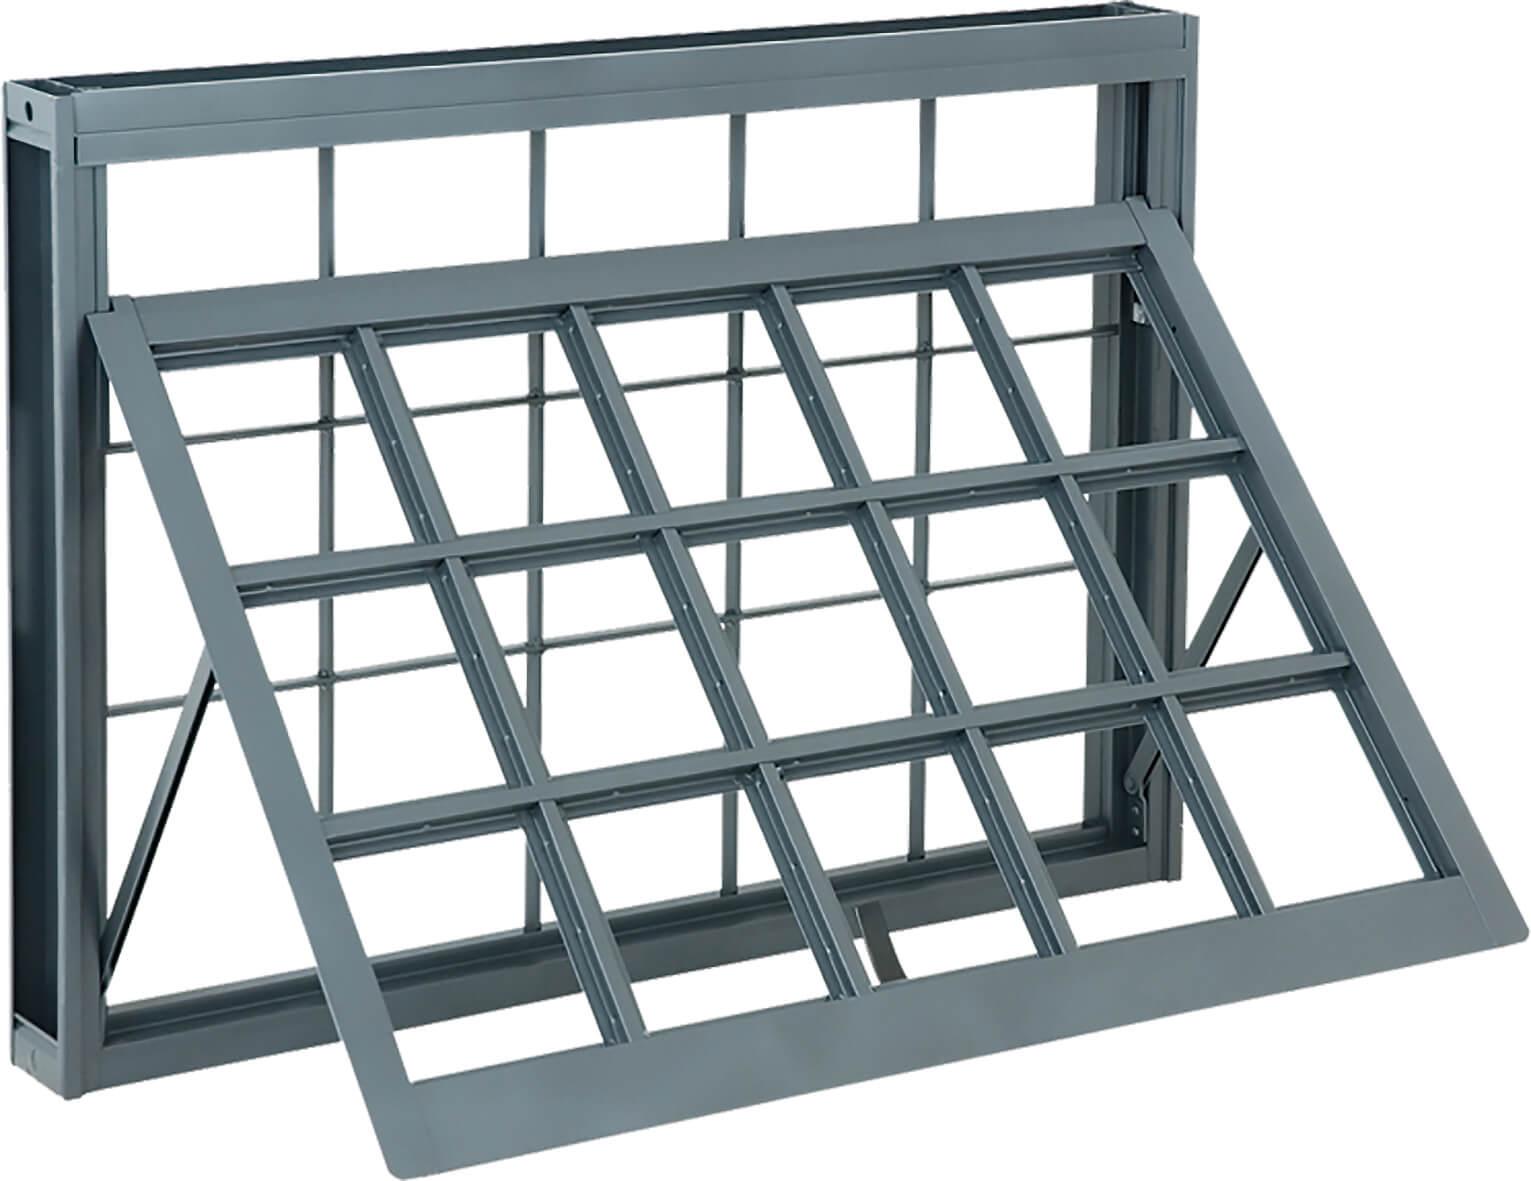 Silenfort Janela Maxim-Ar - 0.60x0.60x08 Sasazaki Ref. 64.23.303-3